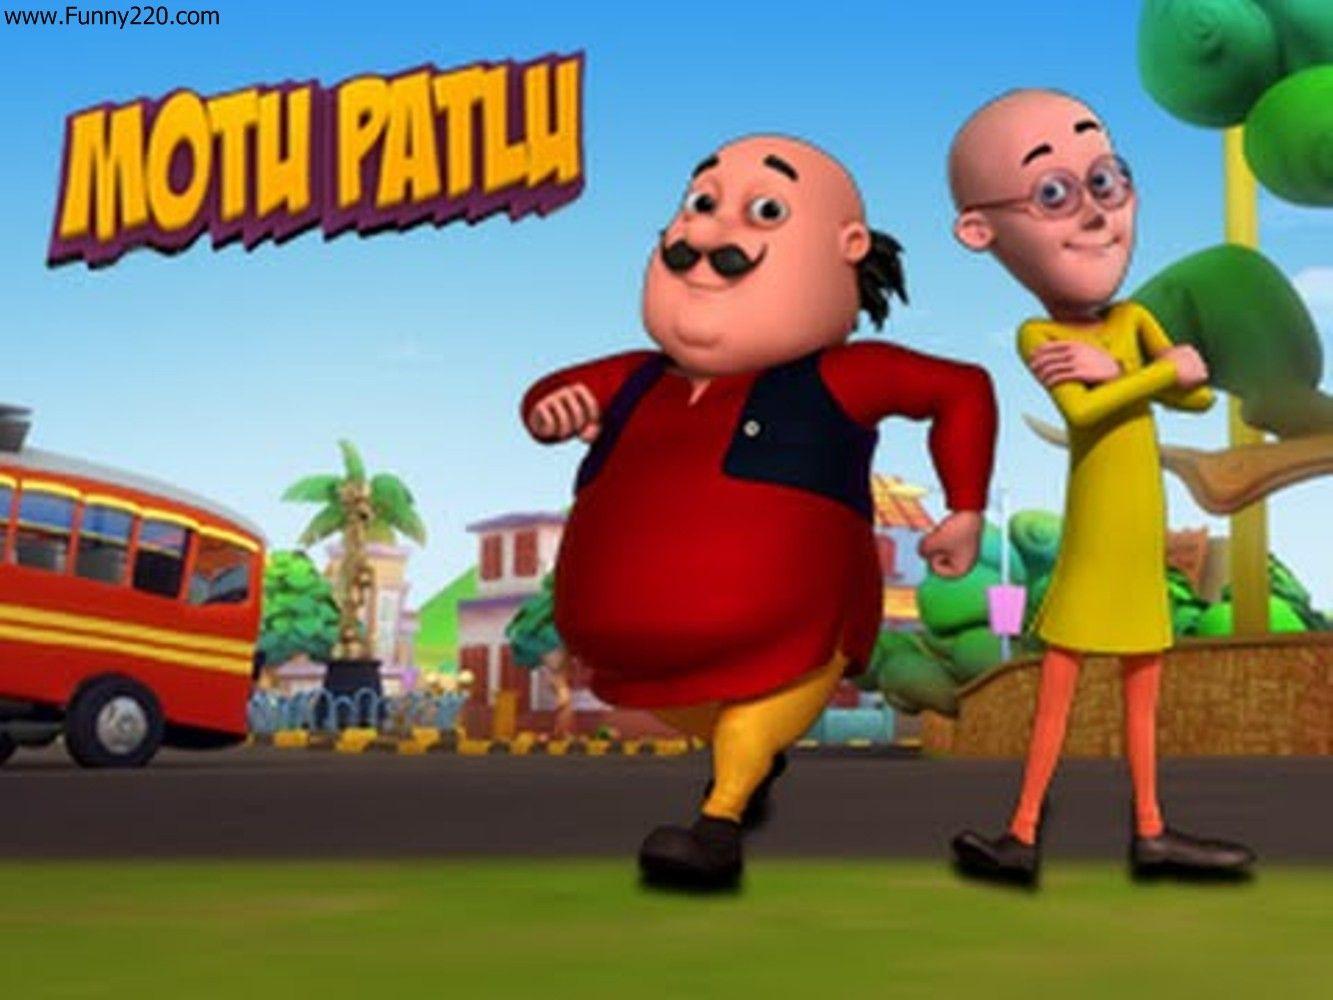 Letest Motu Patalu HD wallpapers, Get free high definition ...